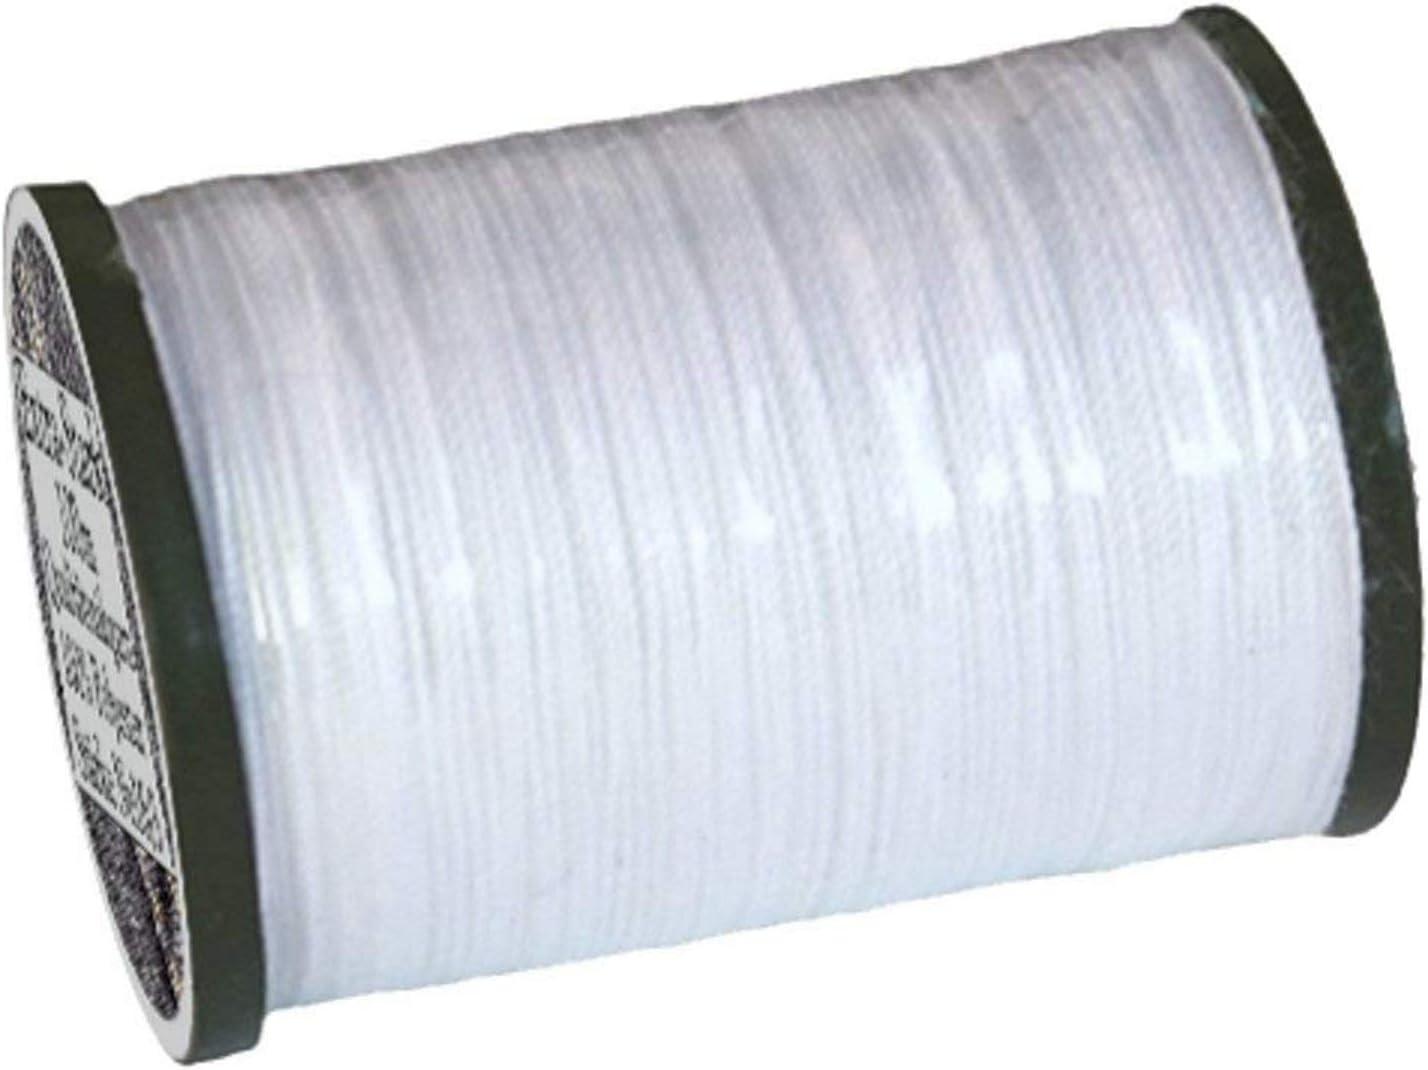 1 pcs de la bobina de 100 m de alto rendimiento - hilo de coser ...